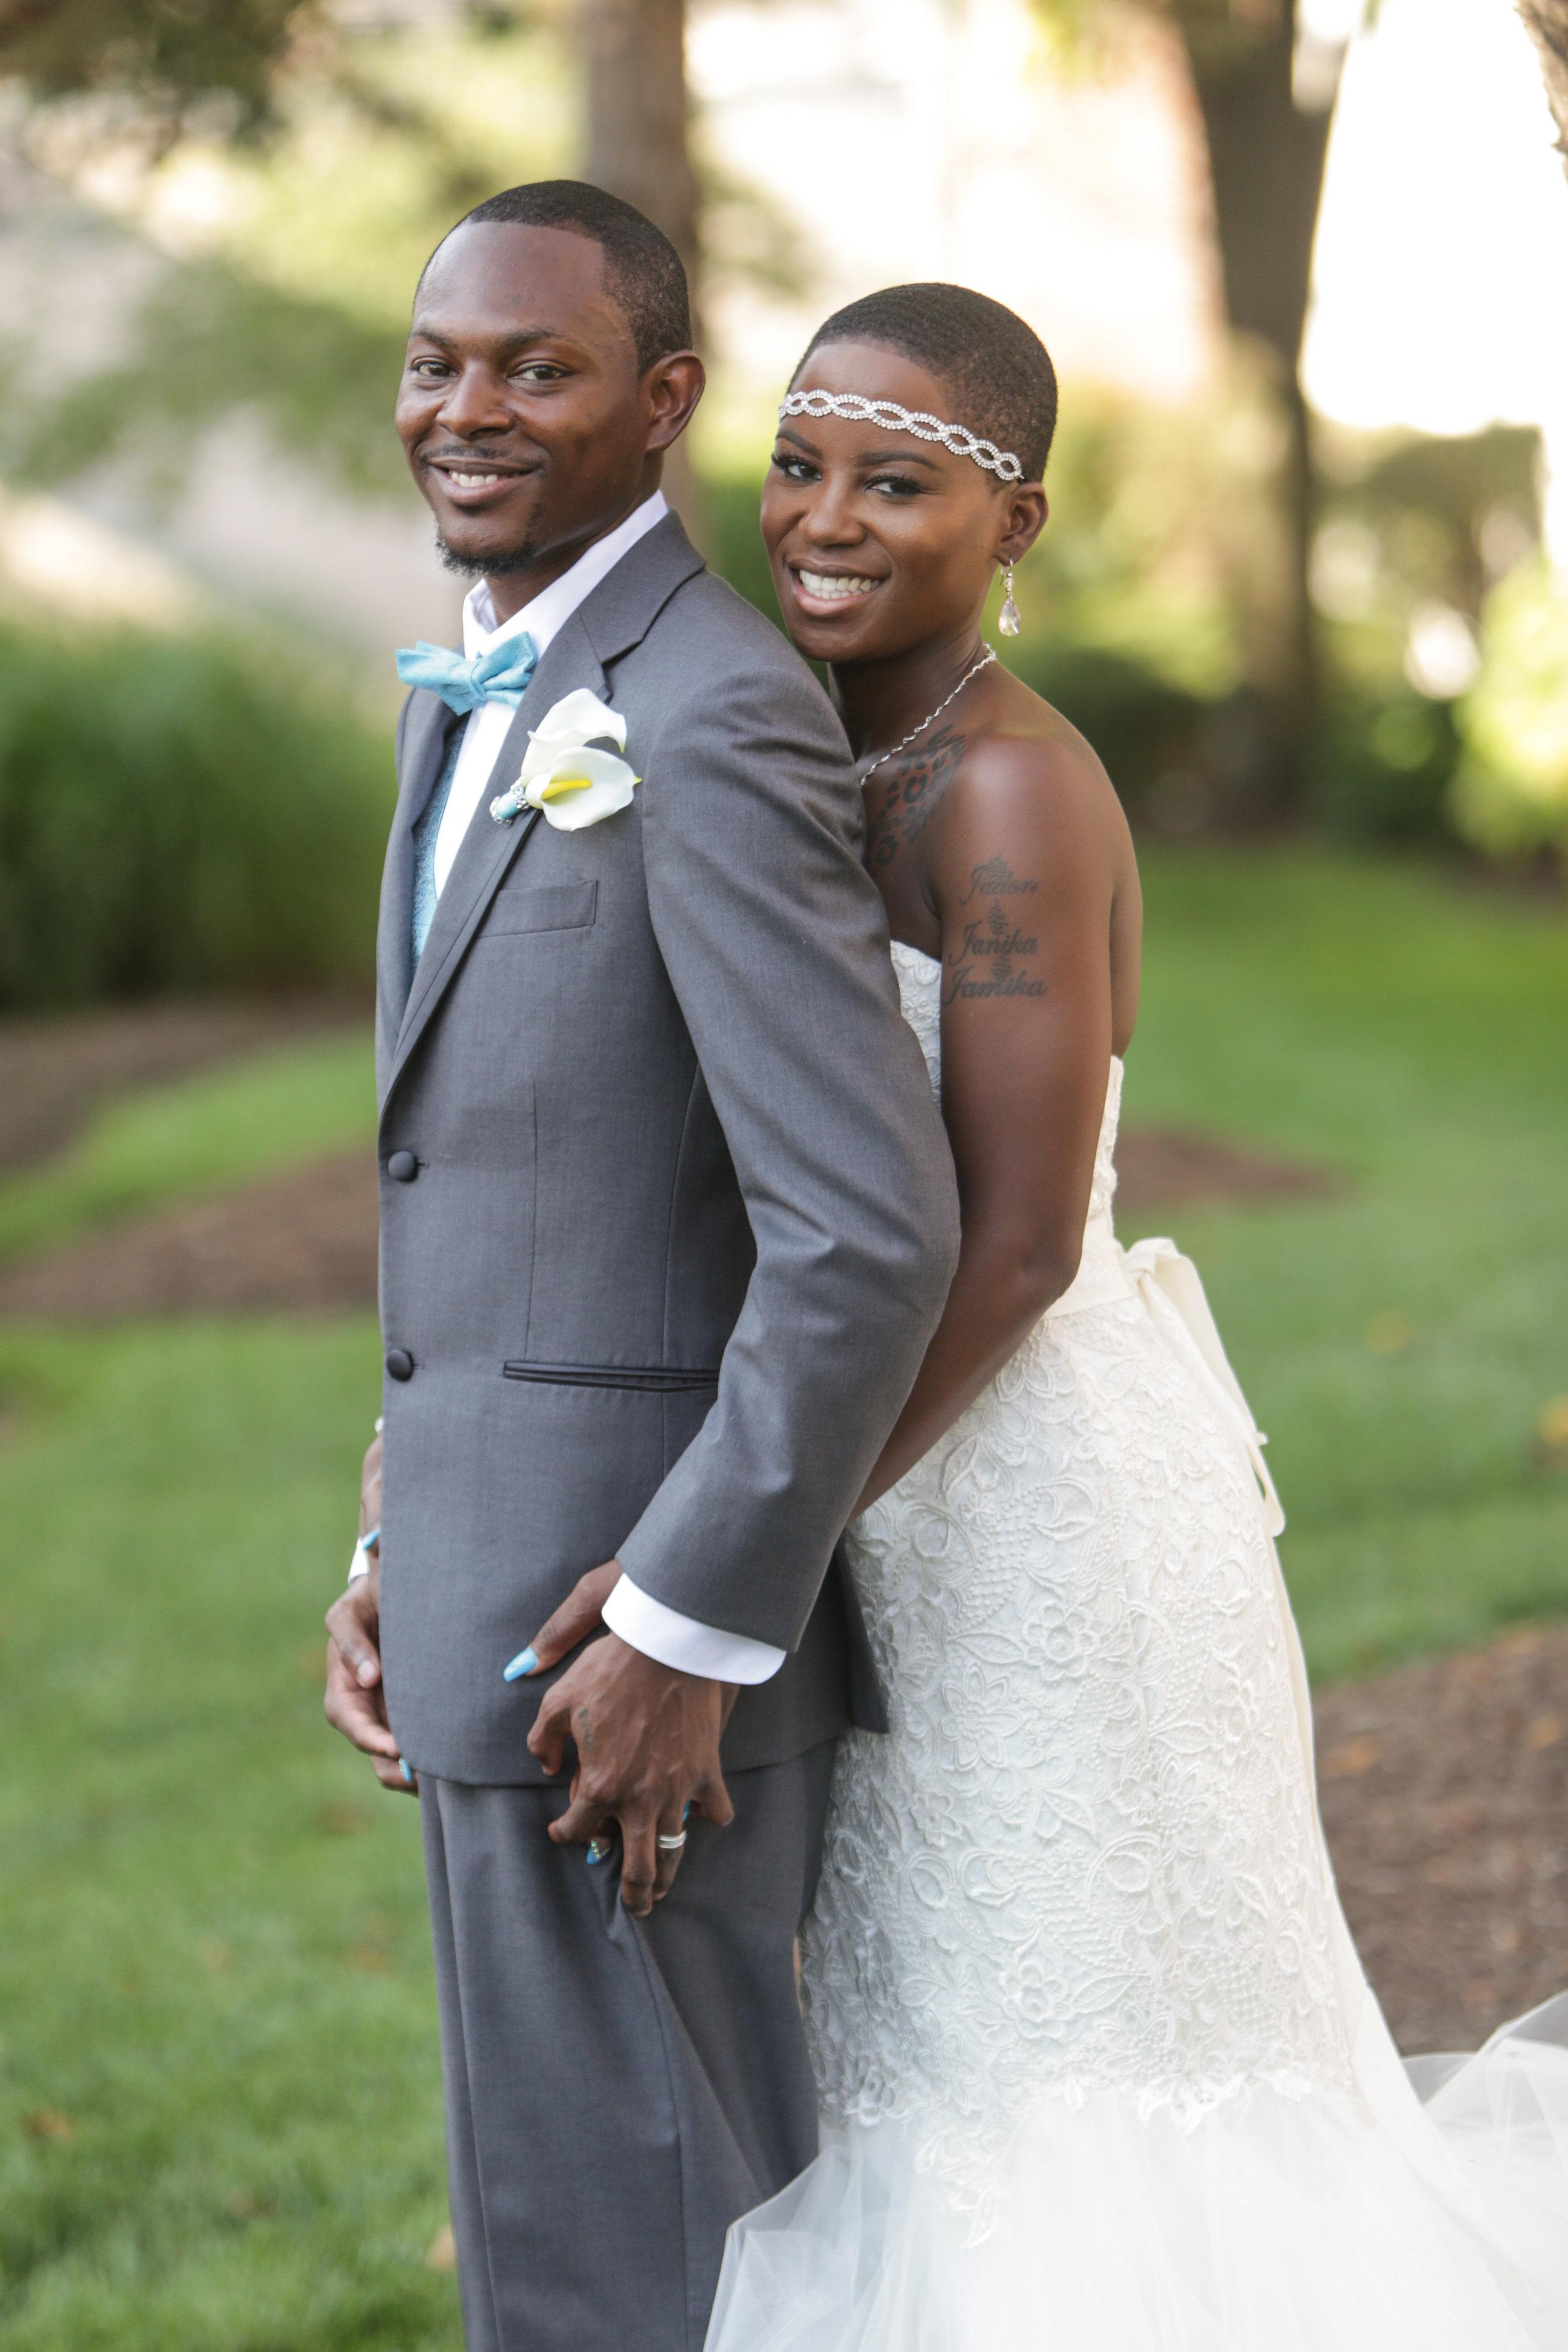 St. Louis Photographer St. Charles Photographer Engagement Wedding Photographer (35).jpg